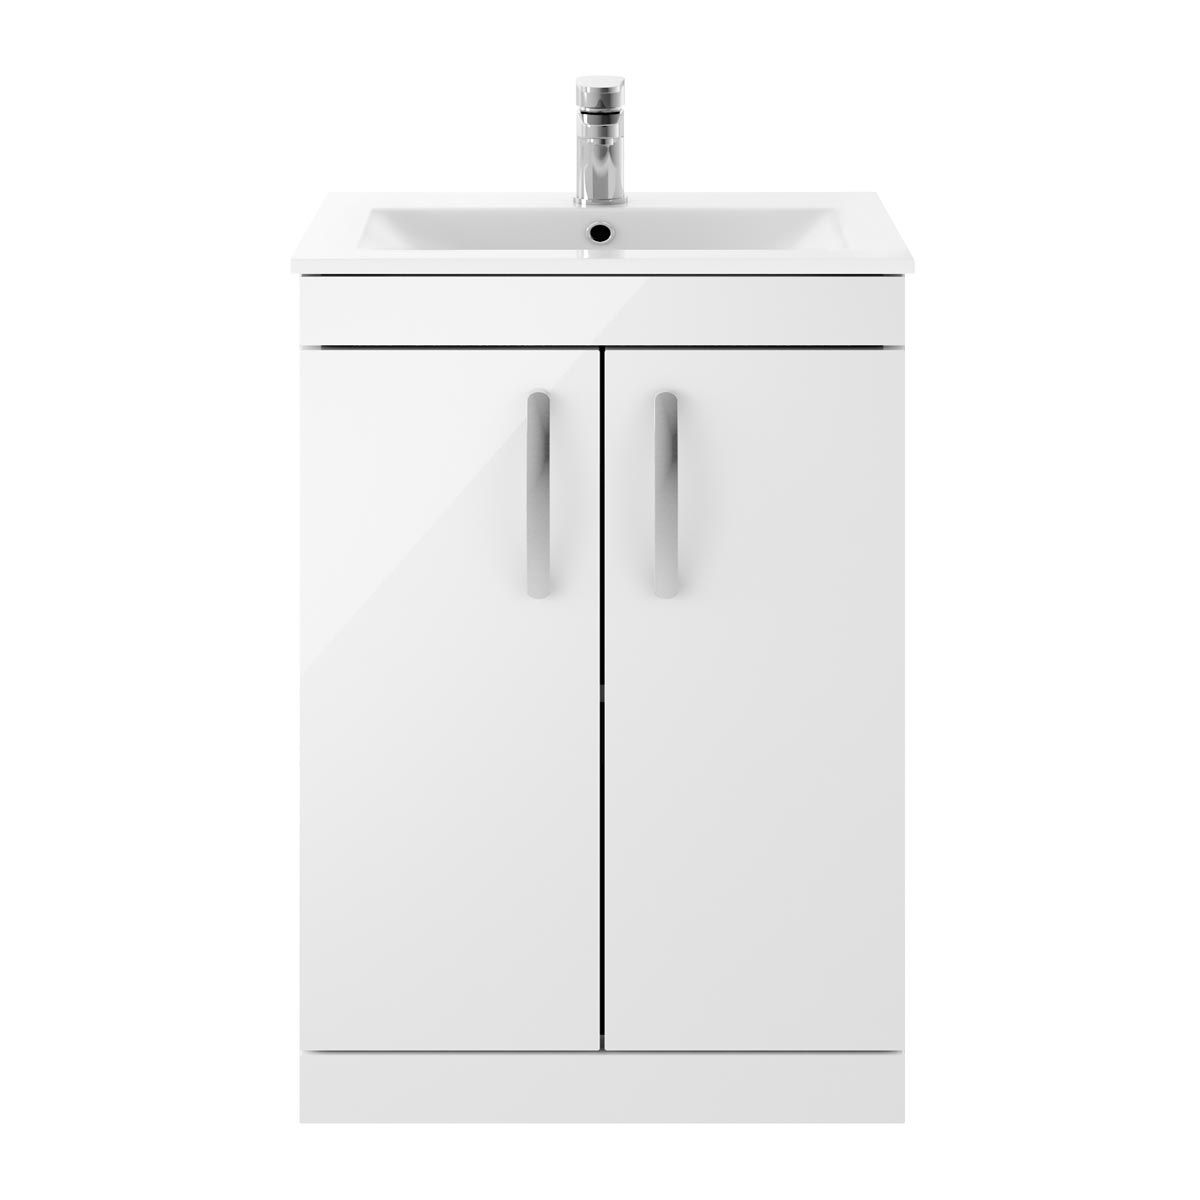 Nuie Athena Gloss White 2 Door Floor Standing Vanity Unit with 18mm Profile Basin 500mm